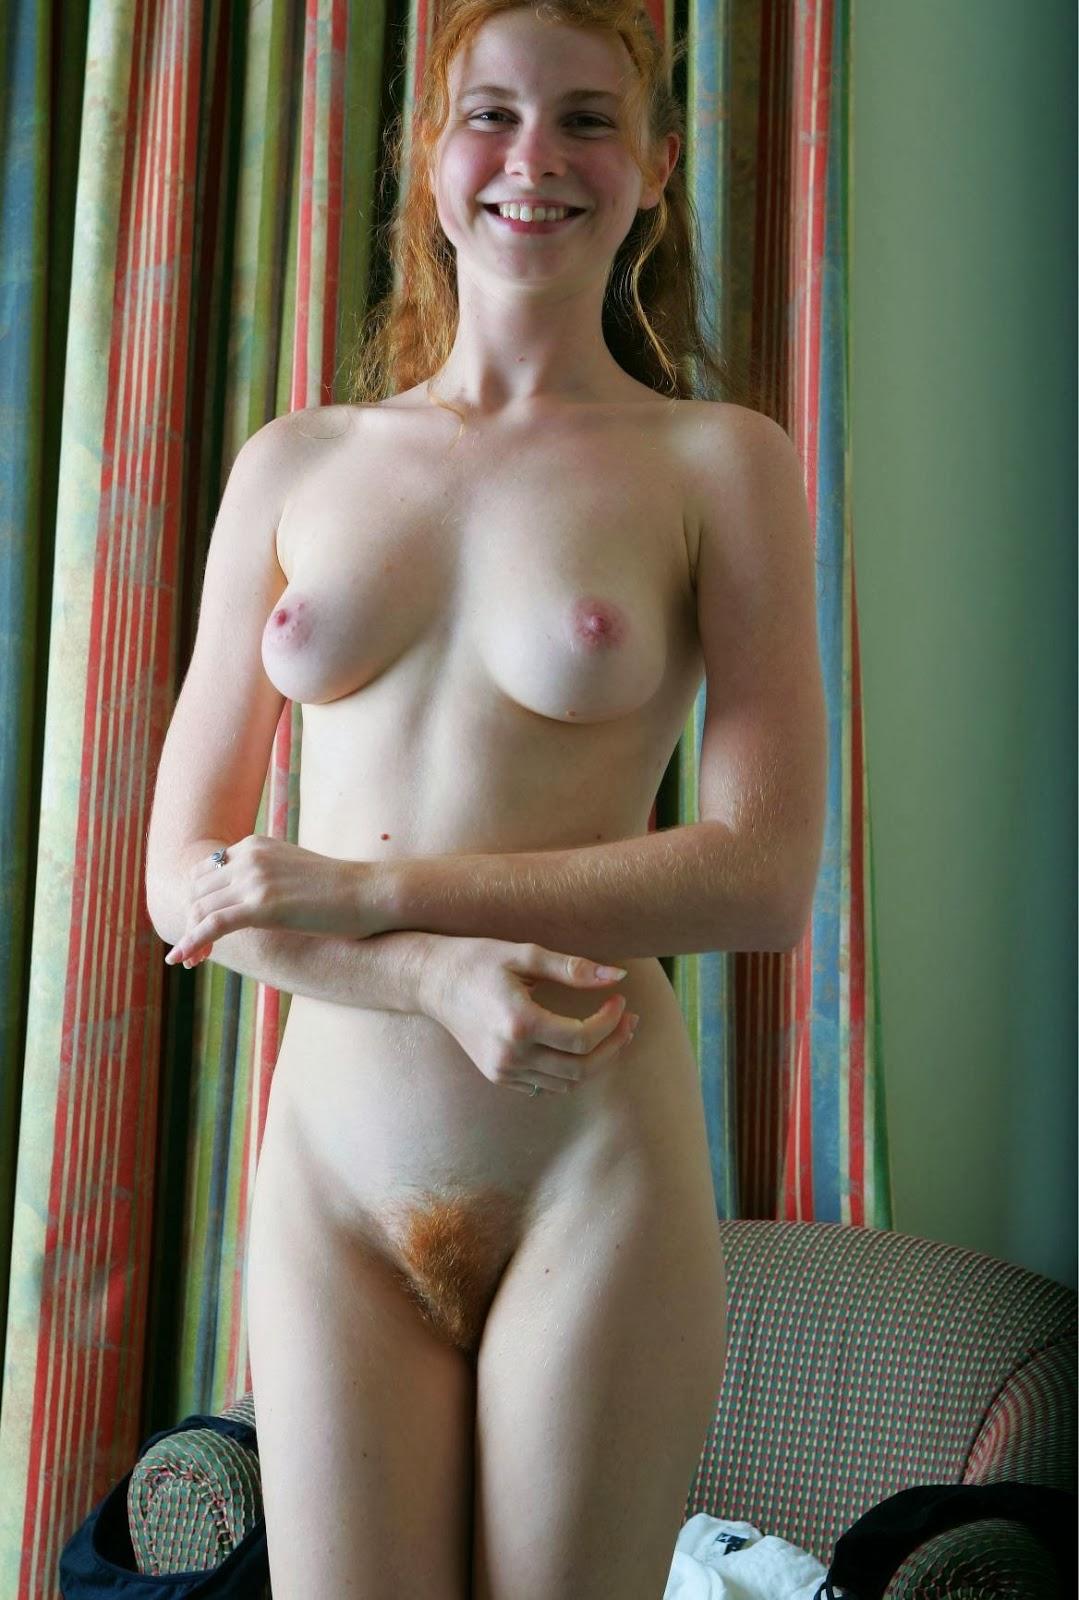 Pelirrojas Desnudas - Videos Porno de Pelirrojas Desnudas